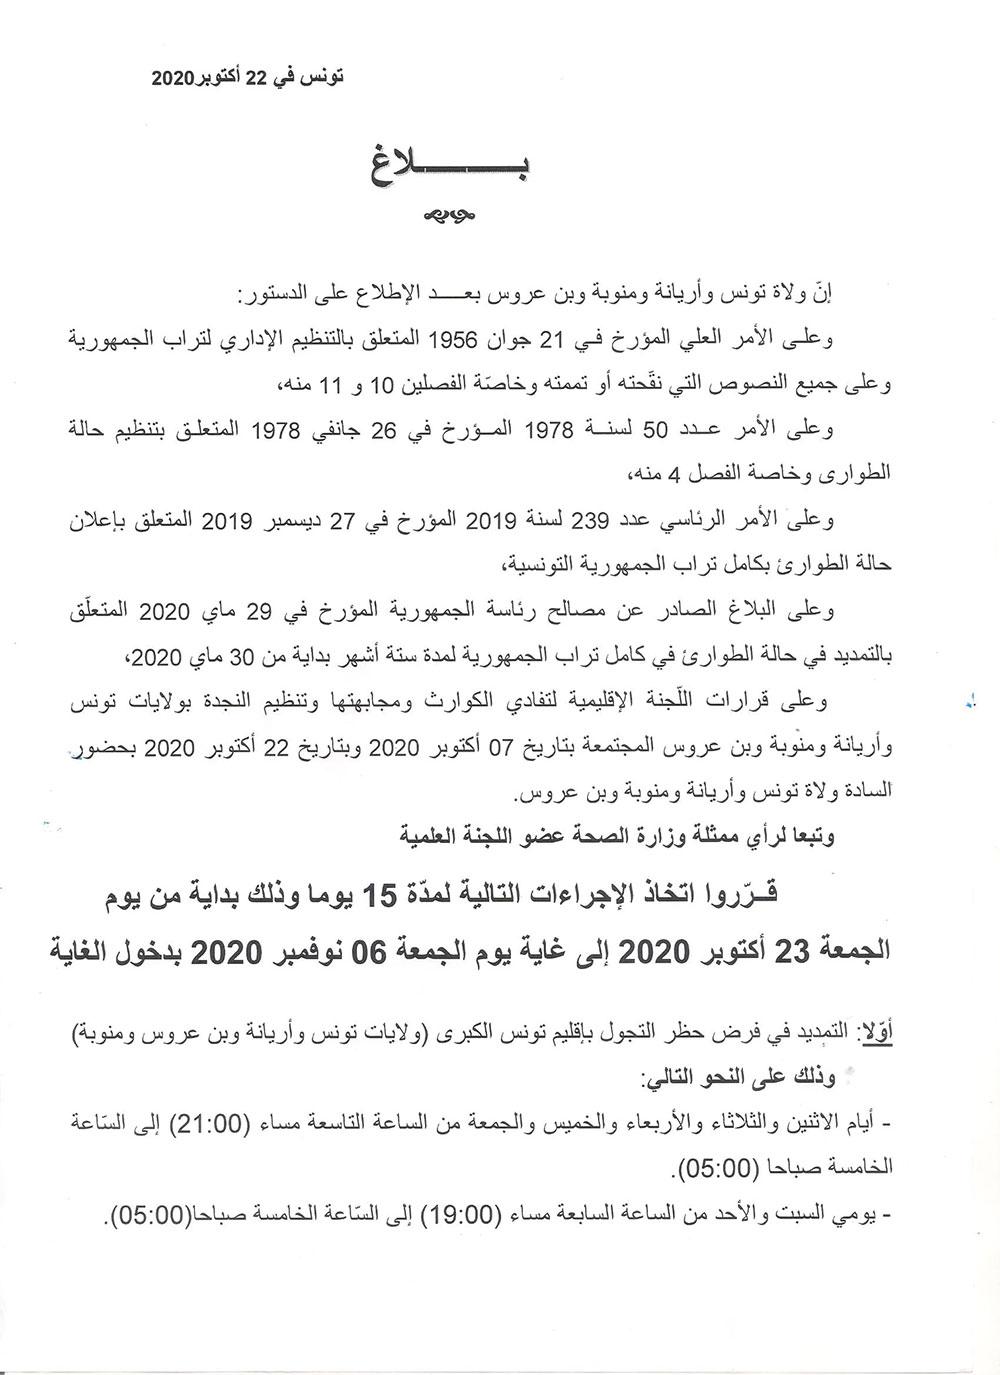 couvre 221020 2 - التمديد في حظر الجولان لمدة 15 يوم إضافية